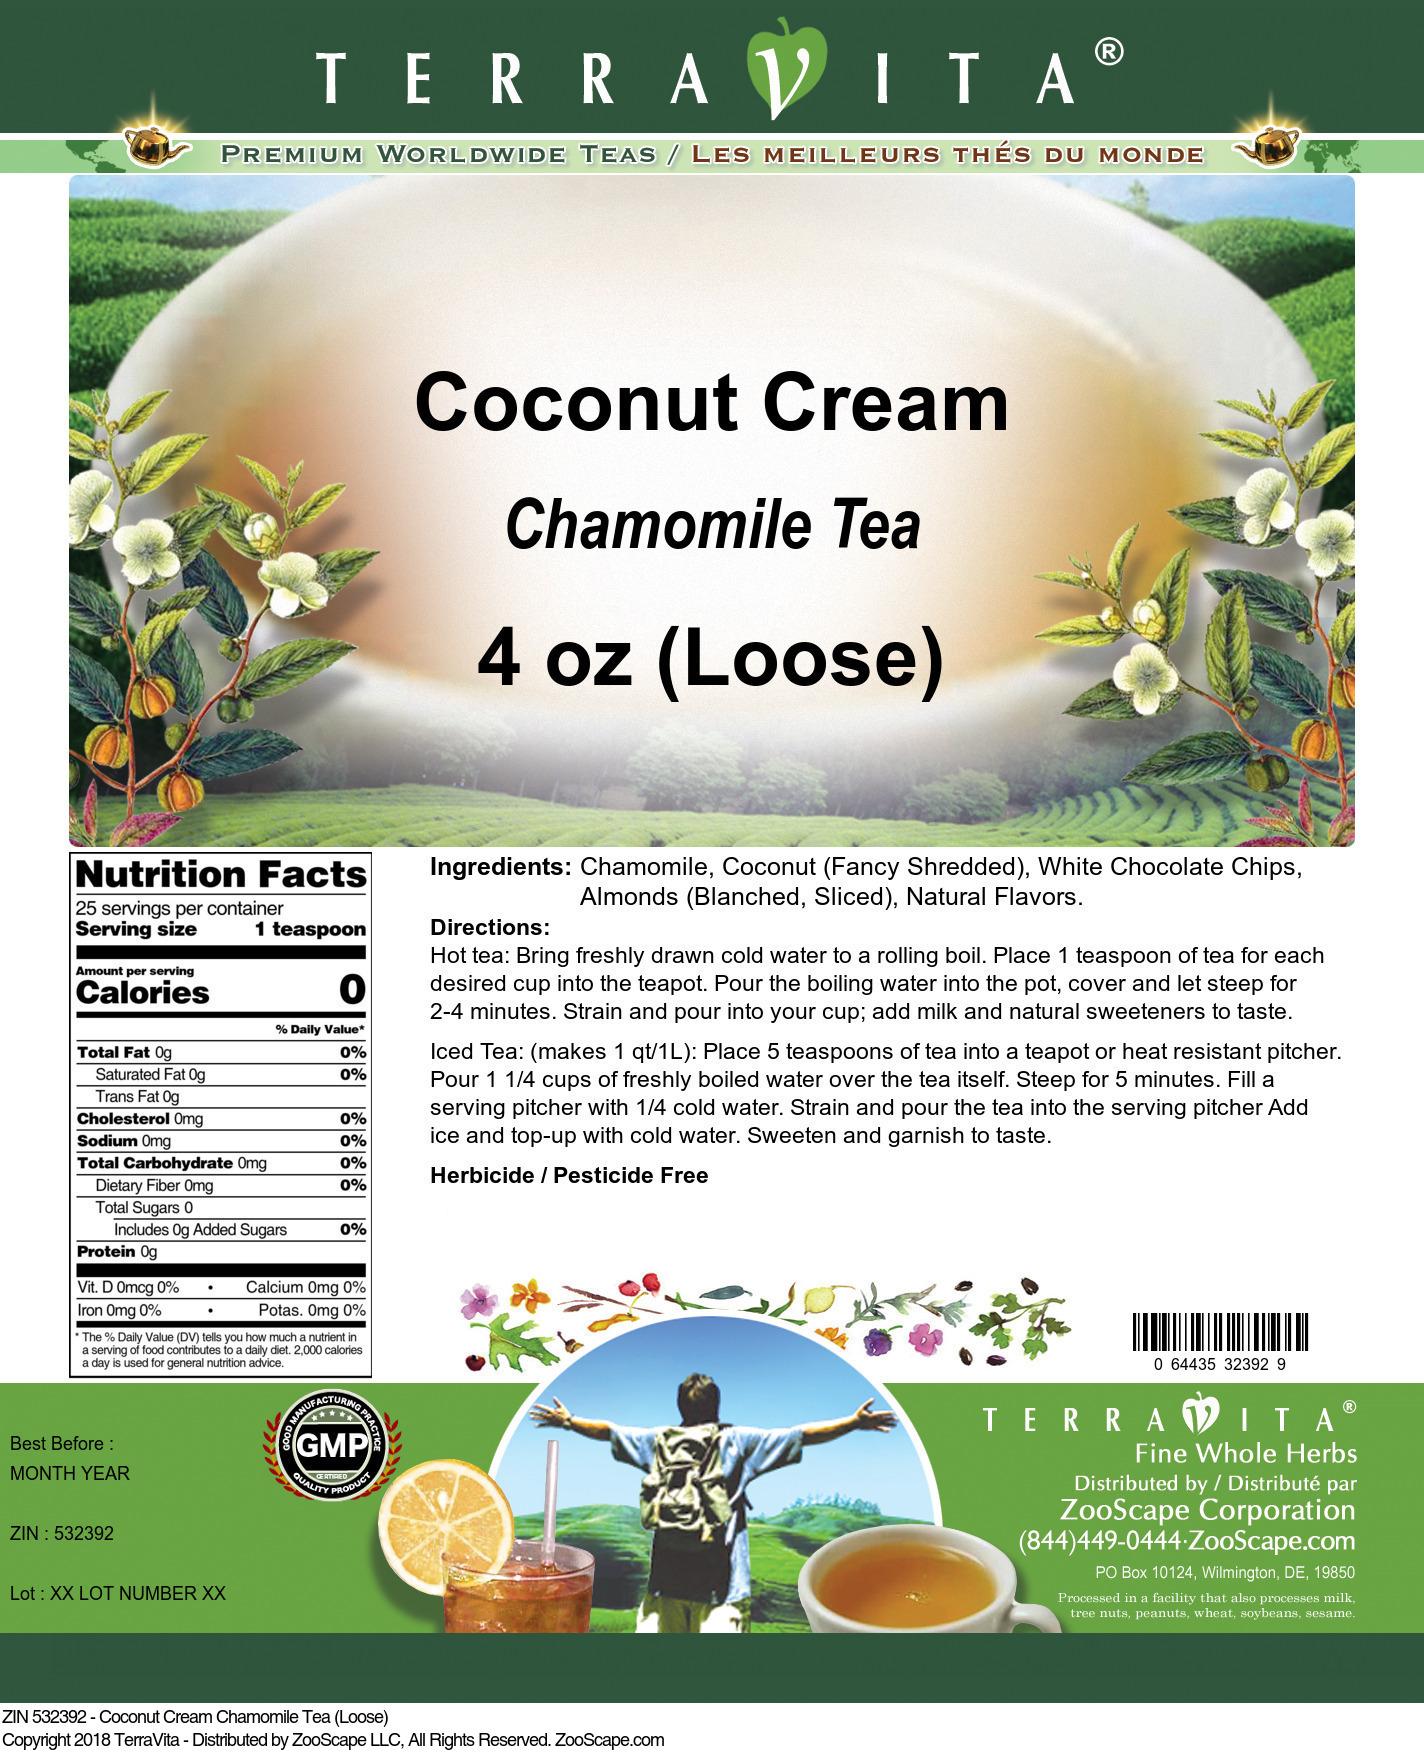 Coconut Cream Chamomile Tea (Loose)